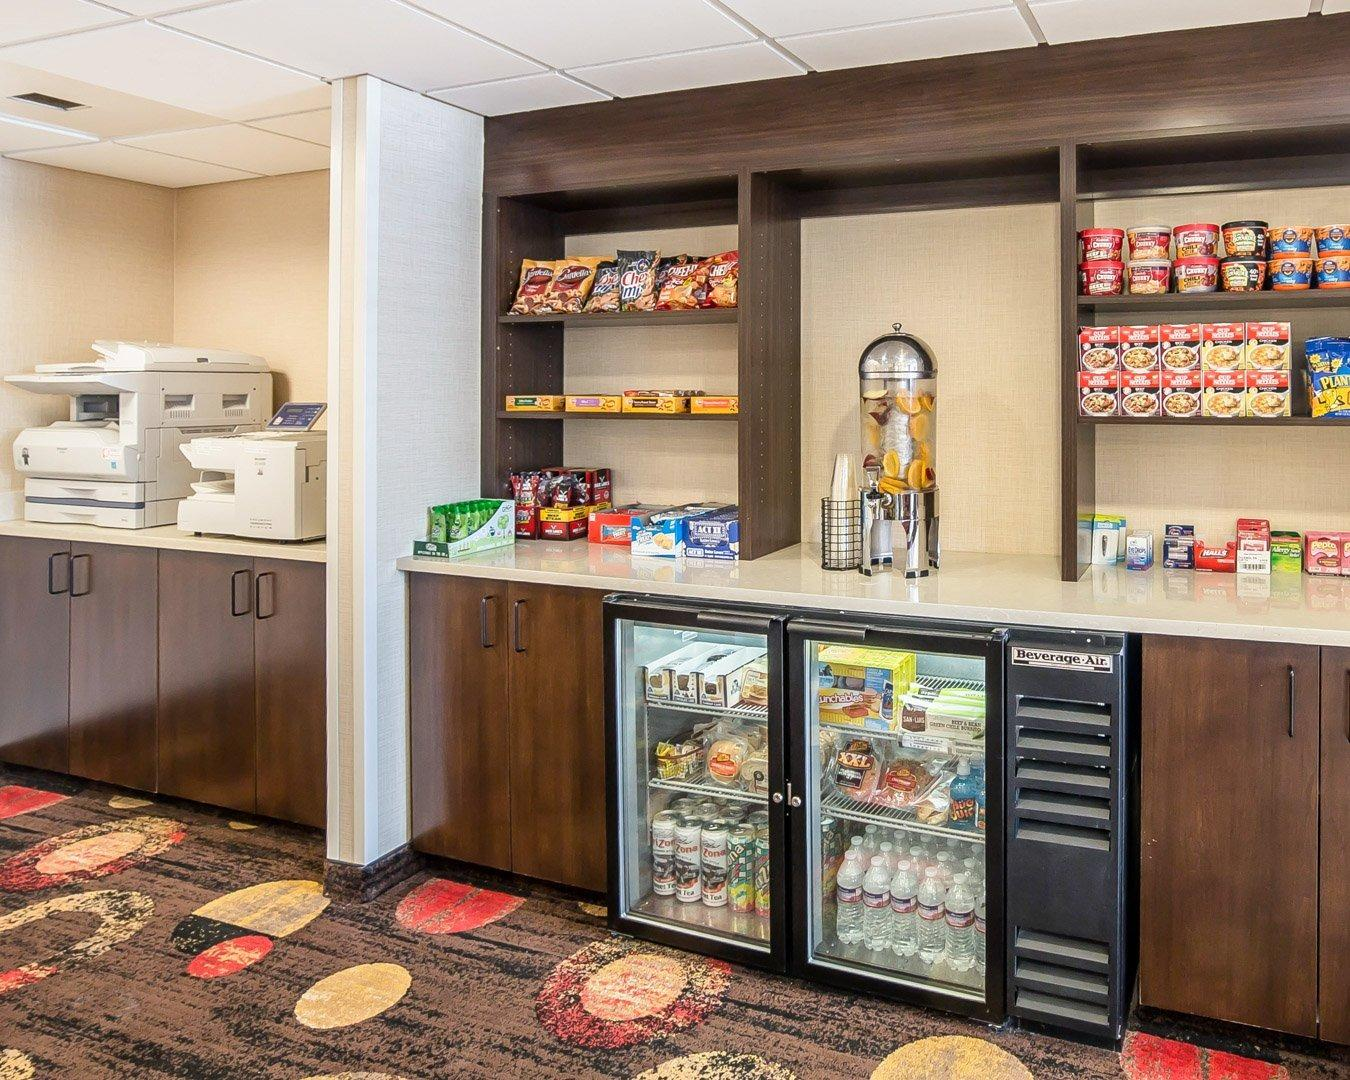 Comfort Inn Gateway to Glacier, Shelby MT